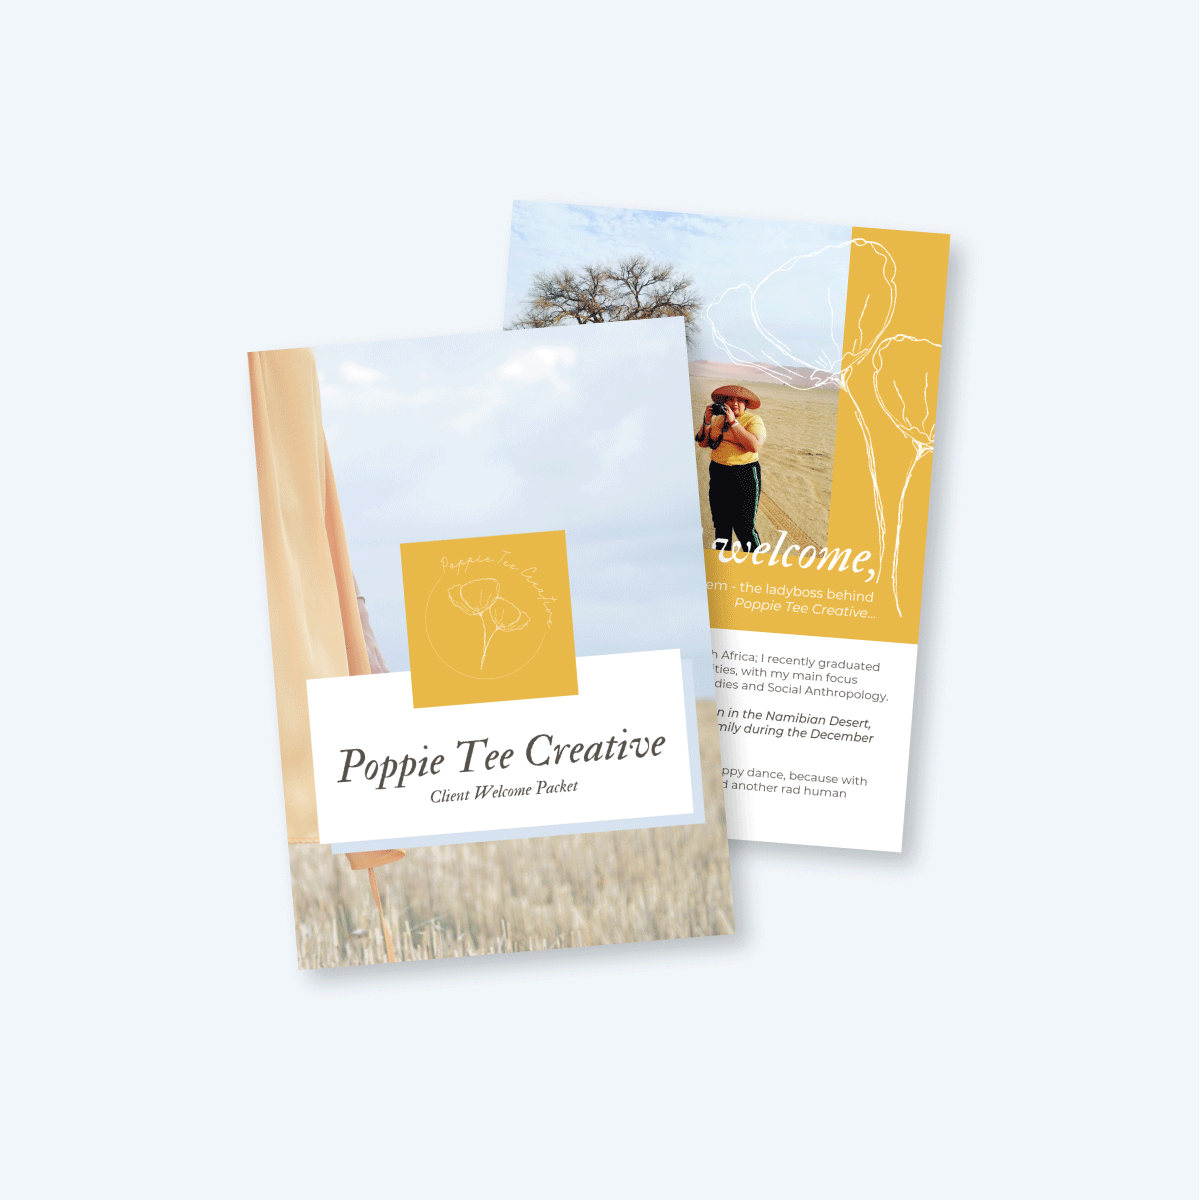 Poppie-Tee-Creative-mockups-for-portfolio.png